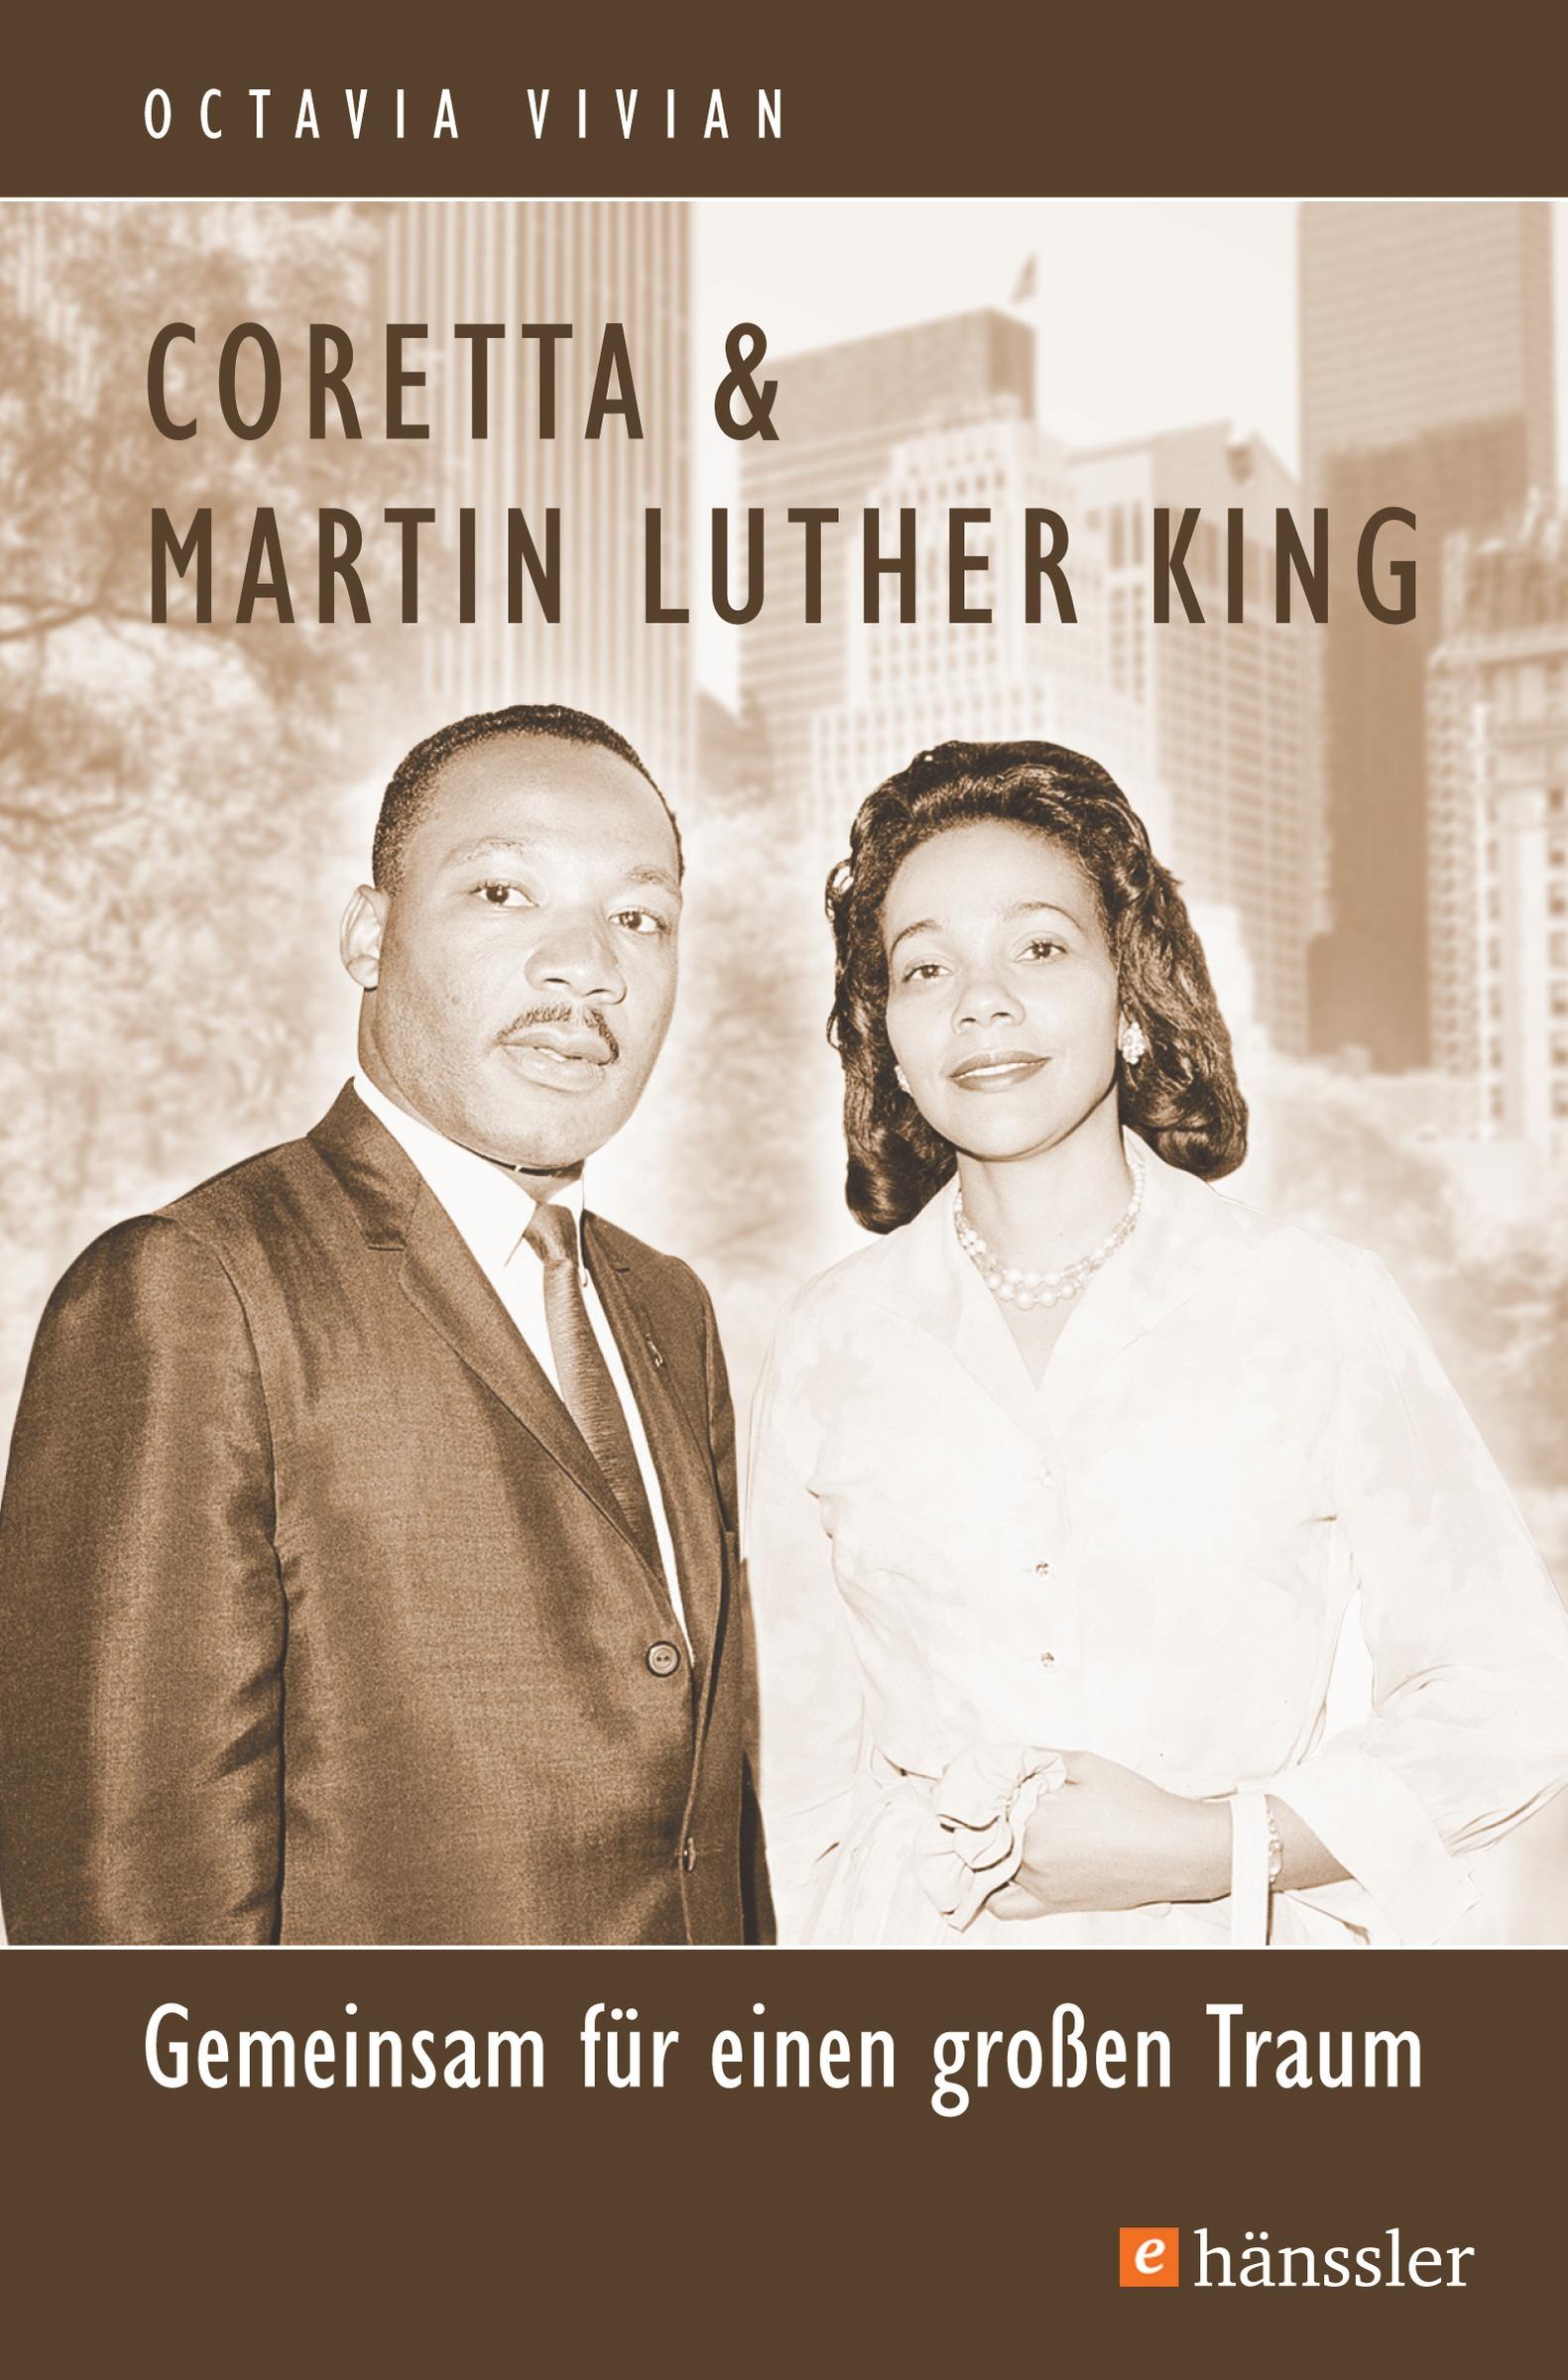 Octavia Vivian Coretta & Martin Luther King martin luther king jr the last interview